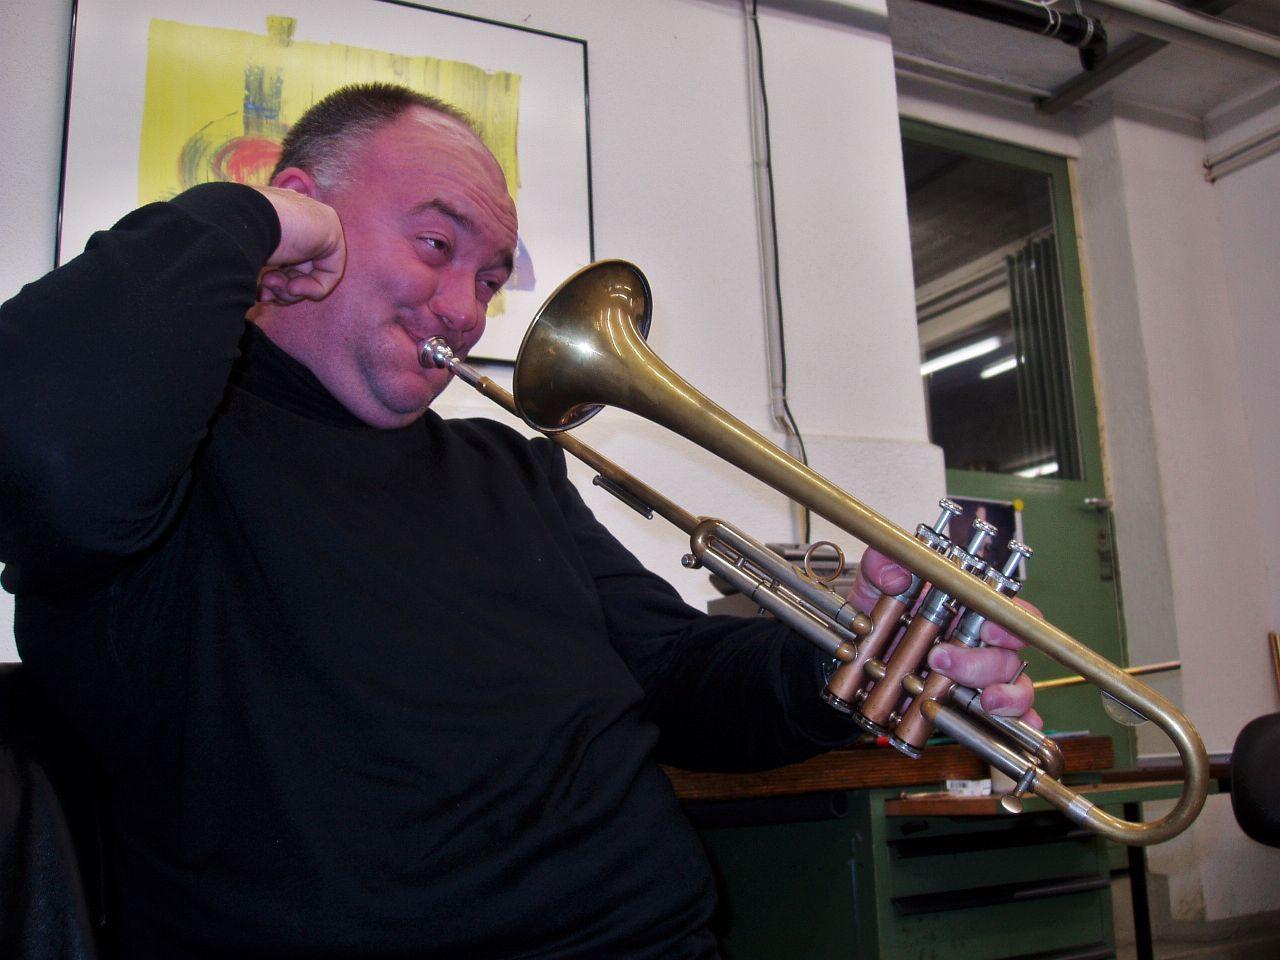 Musiker 269